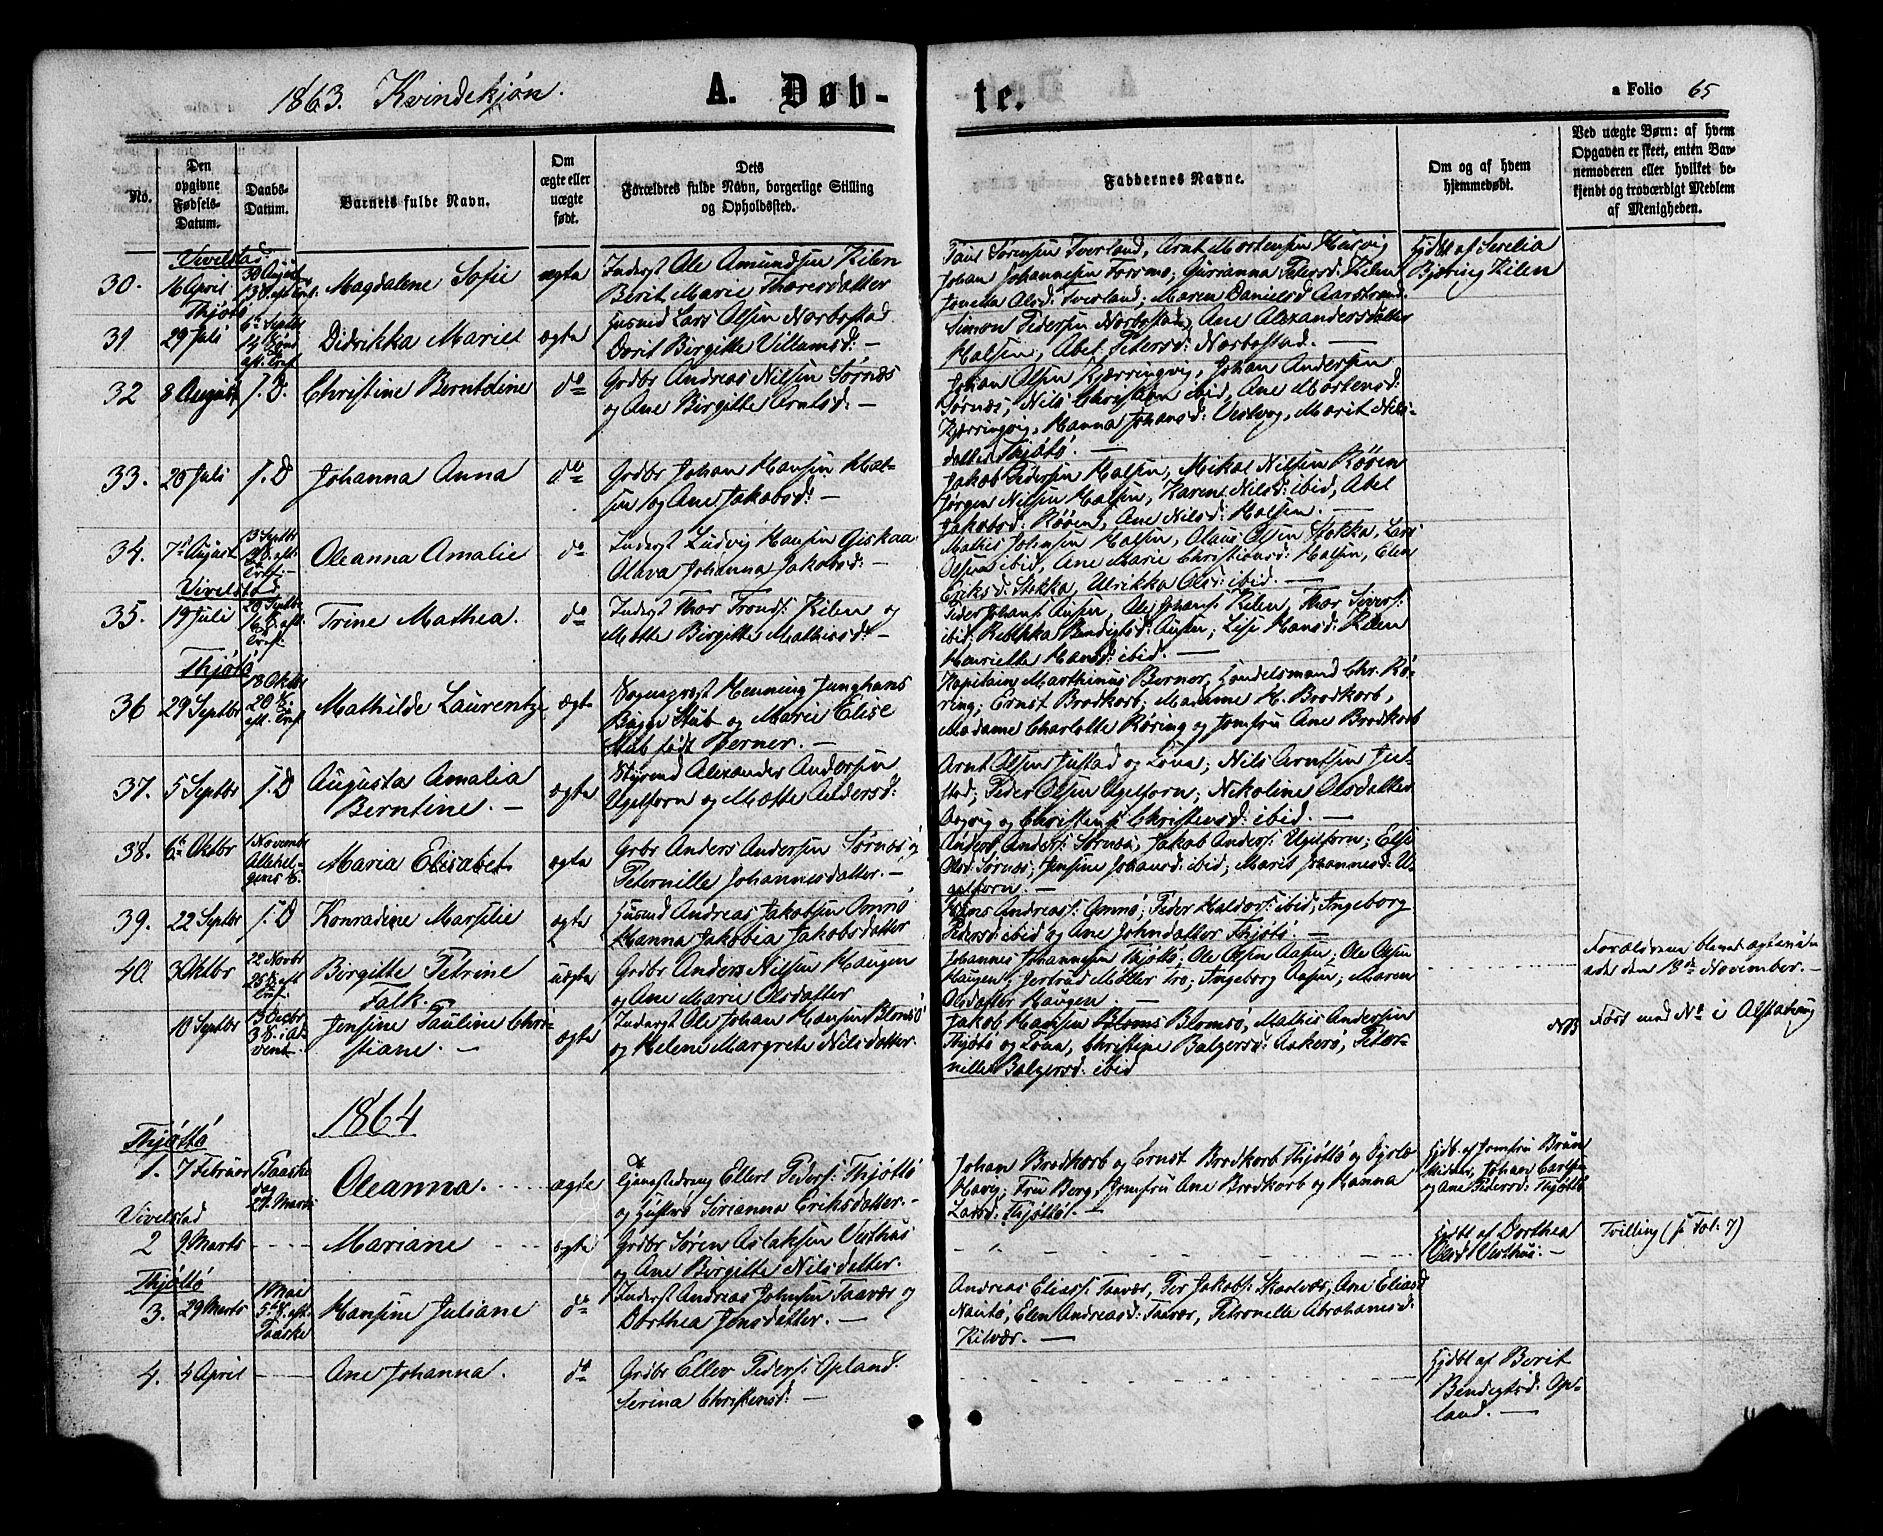 SAT, Ministerialprotokoller, klokkerbøker og fødselsregistre - Nordland, 817/L0262: Ministerialbok nr. 817A03/ 1, 1862-1877, s. 65